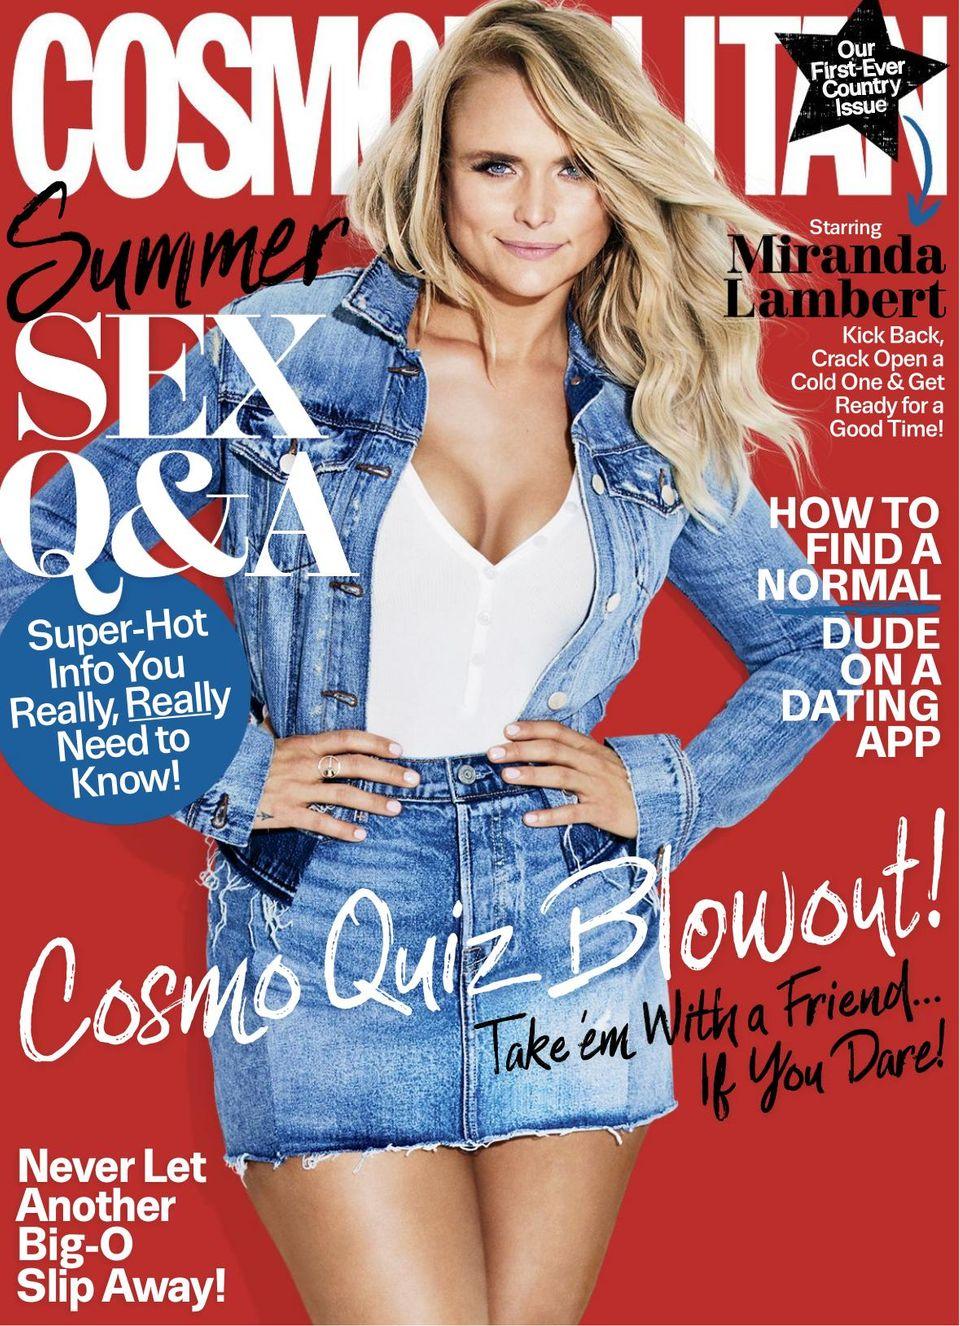 Entrepreneur magazine-March 2017 Magazine - Get your